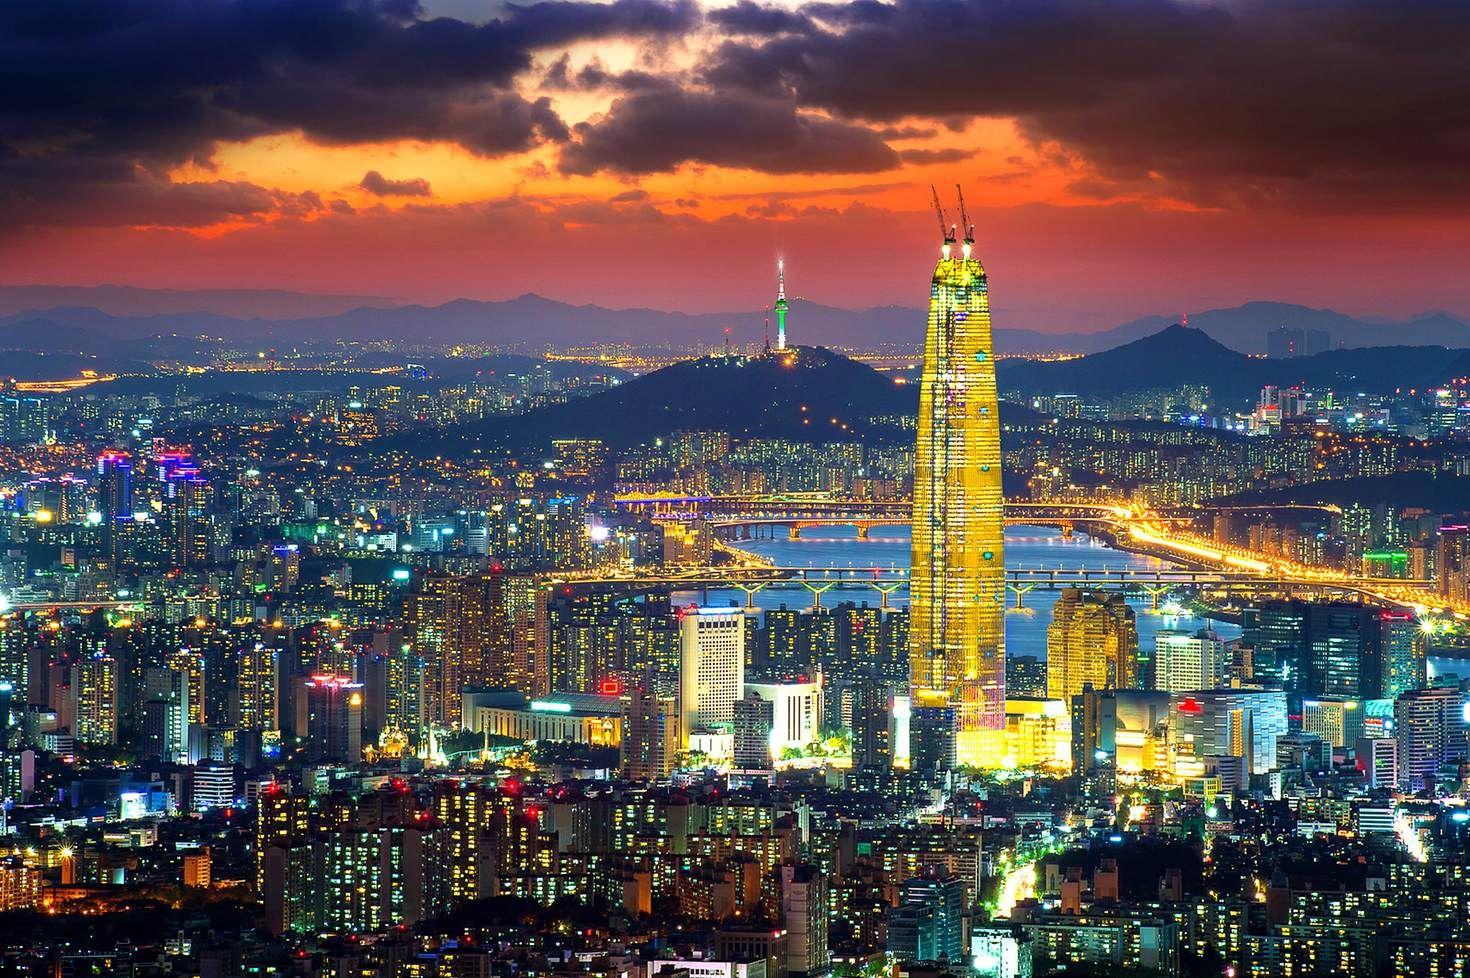 Seoul's dynamic cityscape: an architectural tour through ... - photo#29